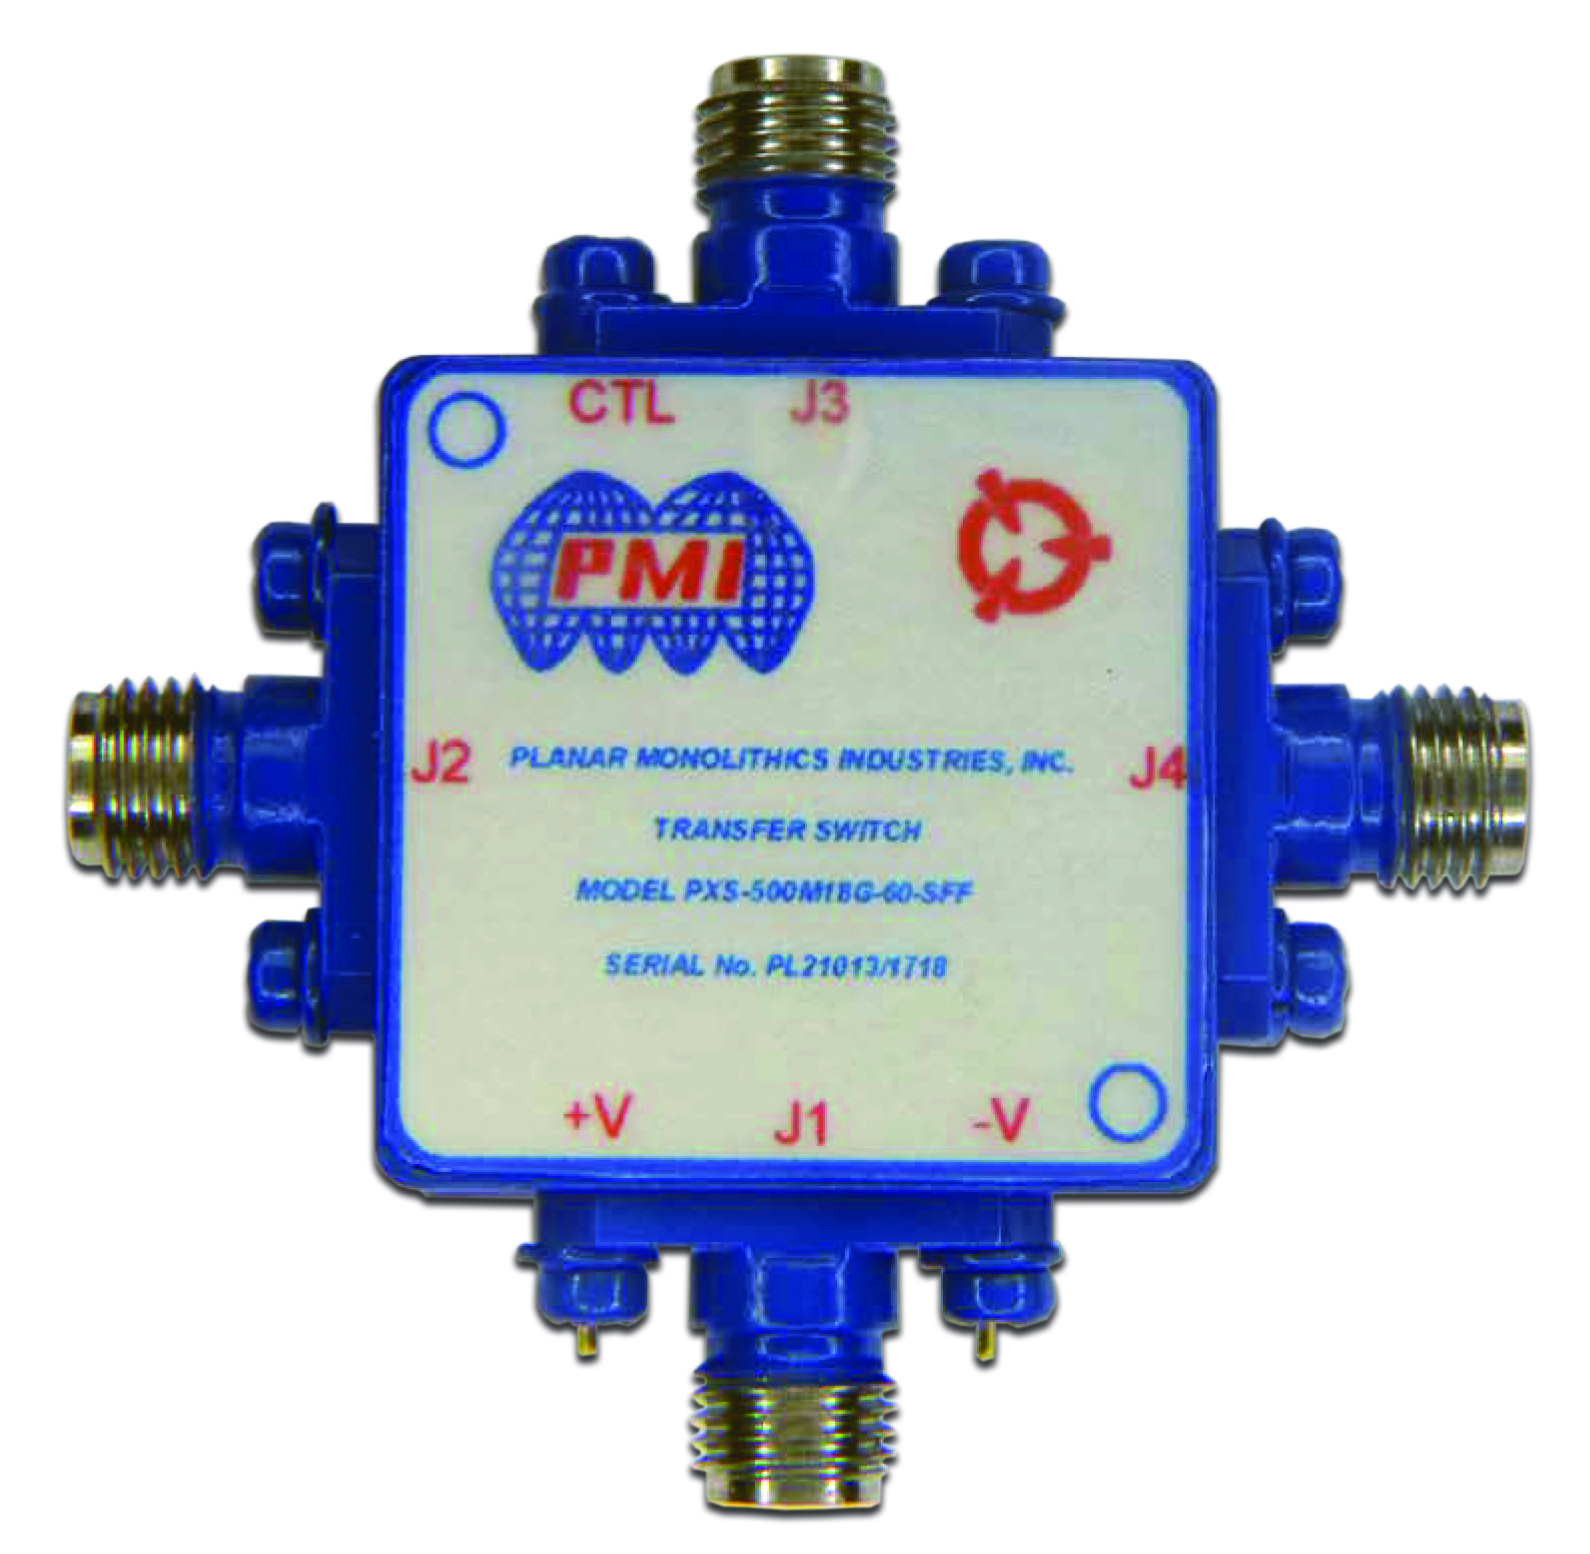 PXS-500M18G-60-SFF.jpg